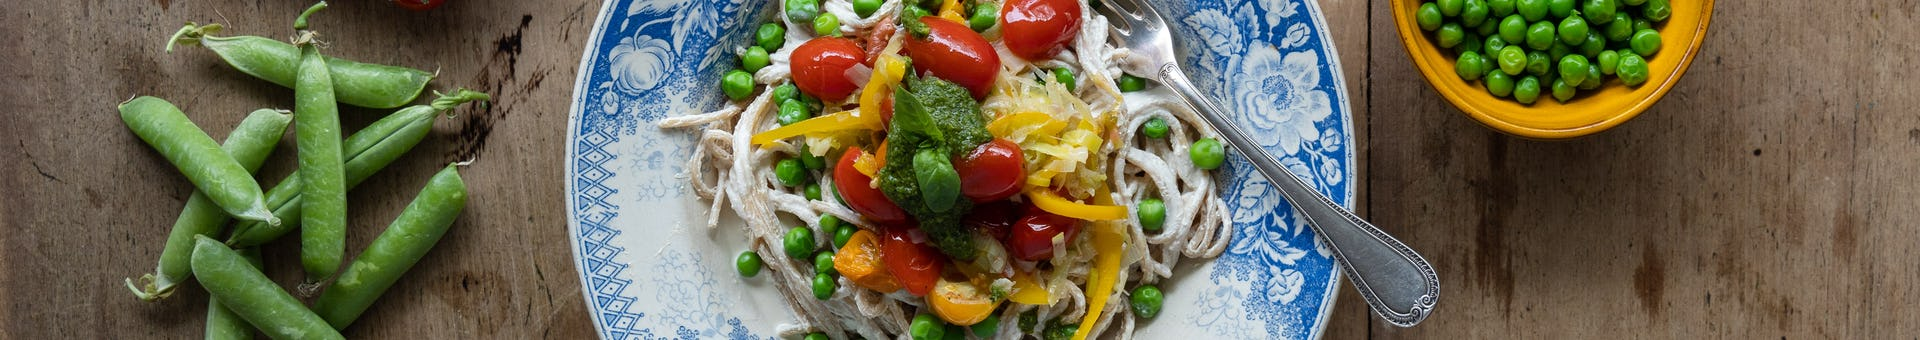 Wk 32 spaghetti vegan creamcheese